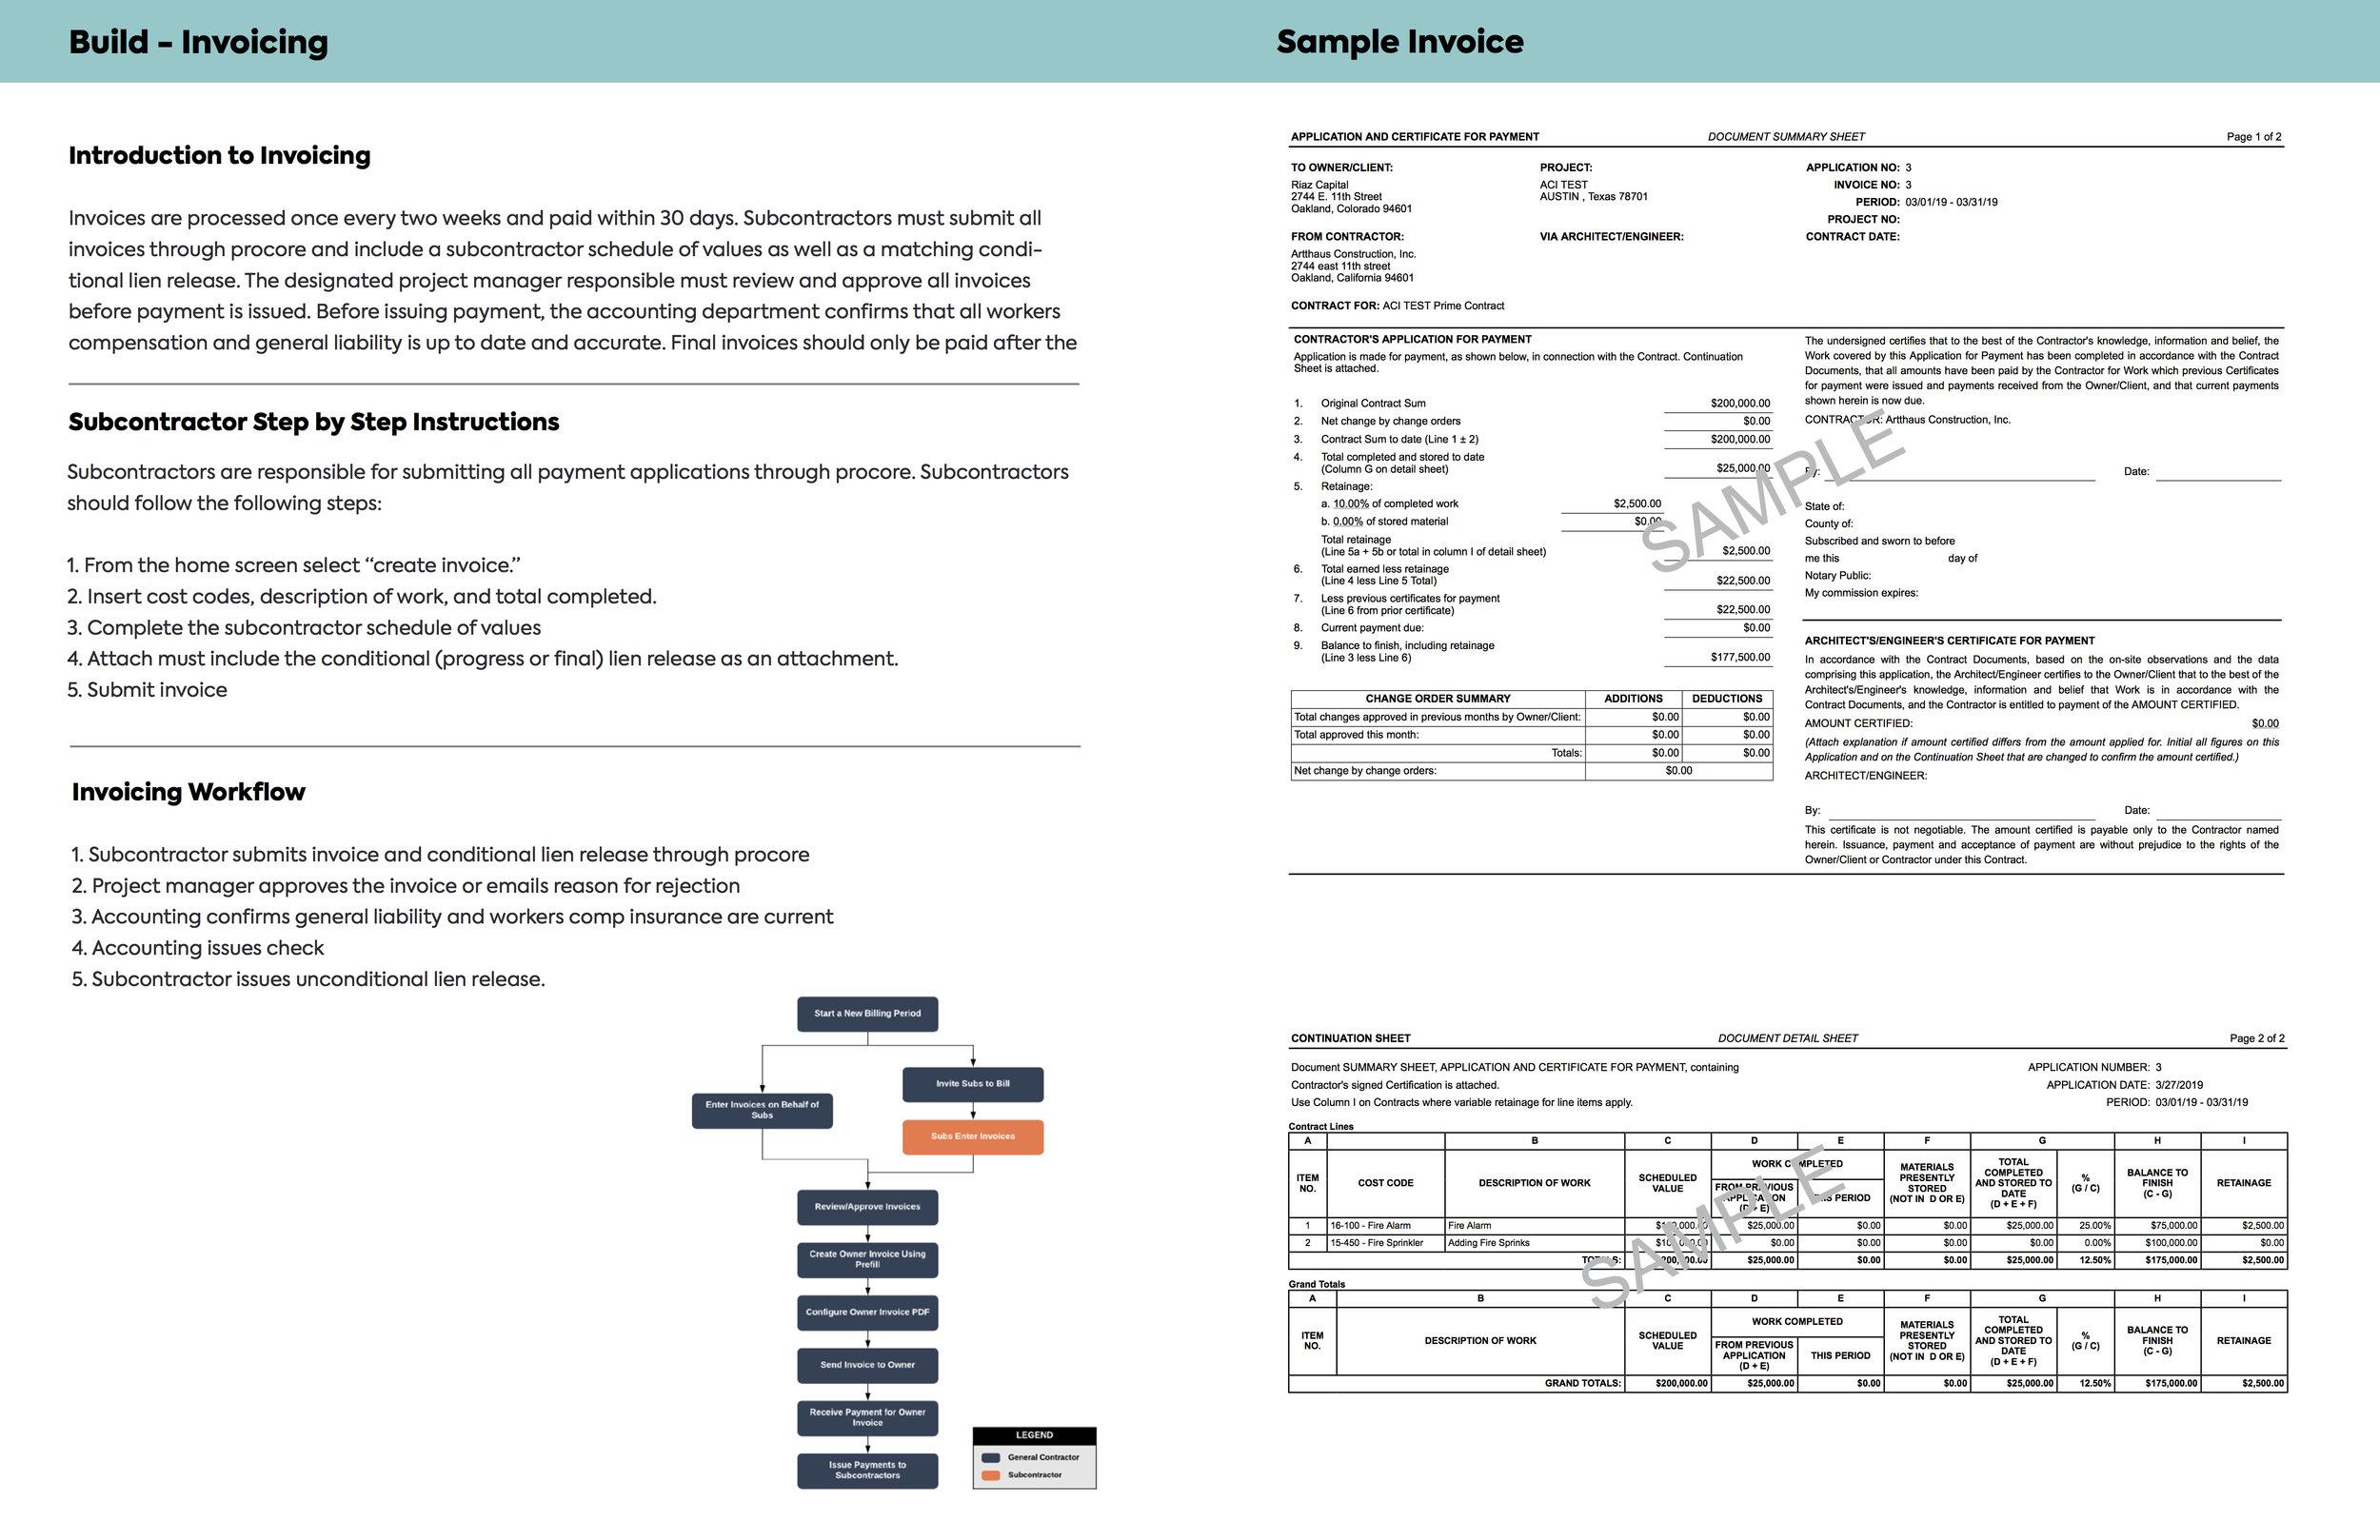 ABD Product Book Manual - 35.jpg